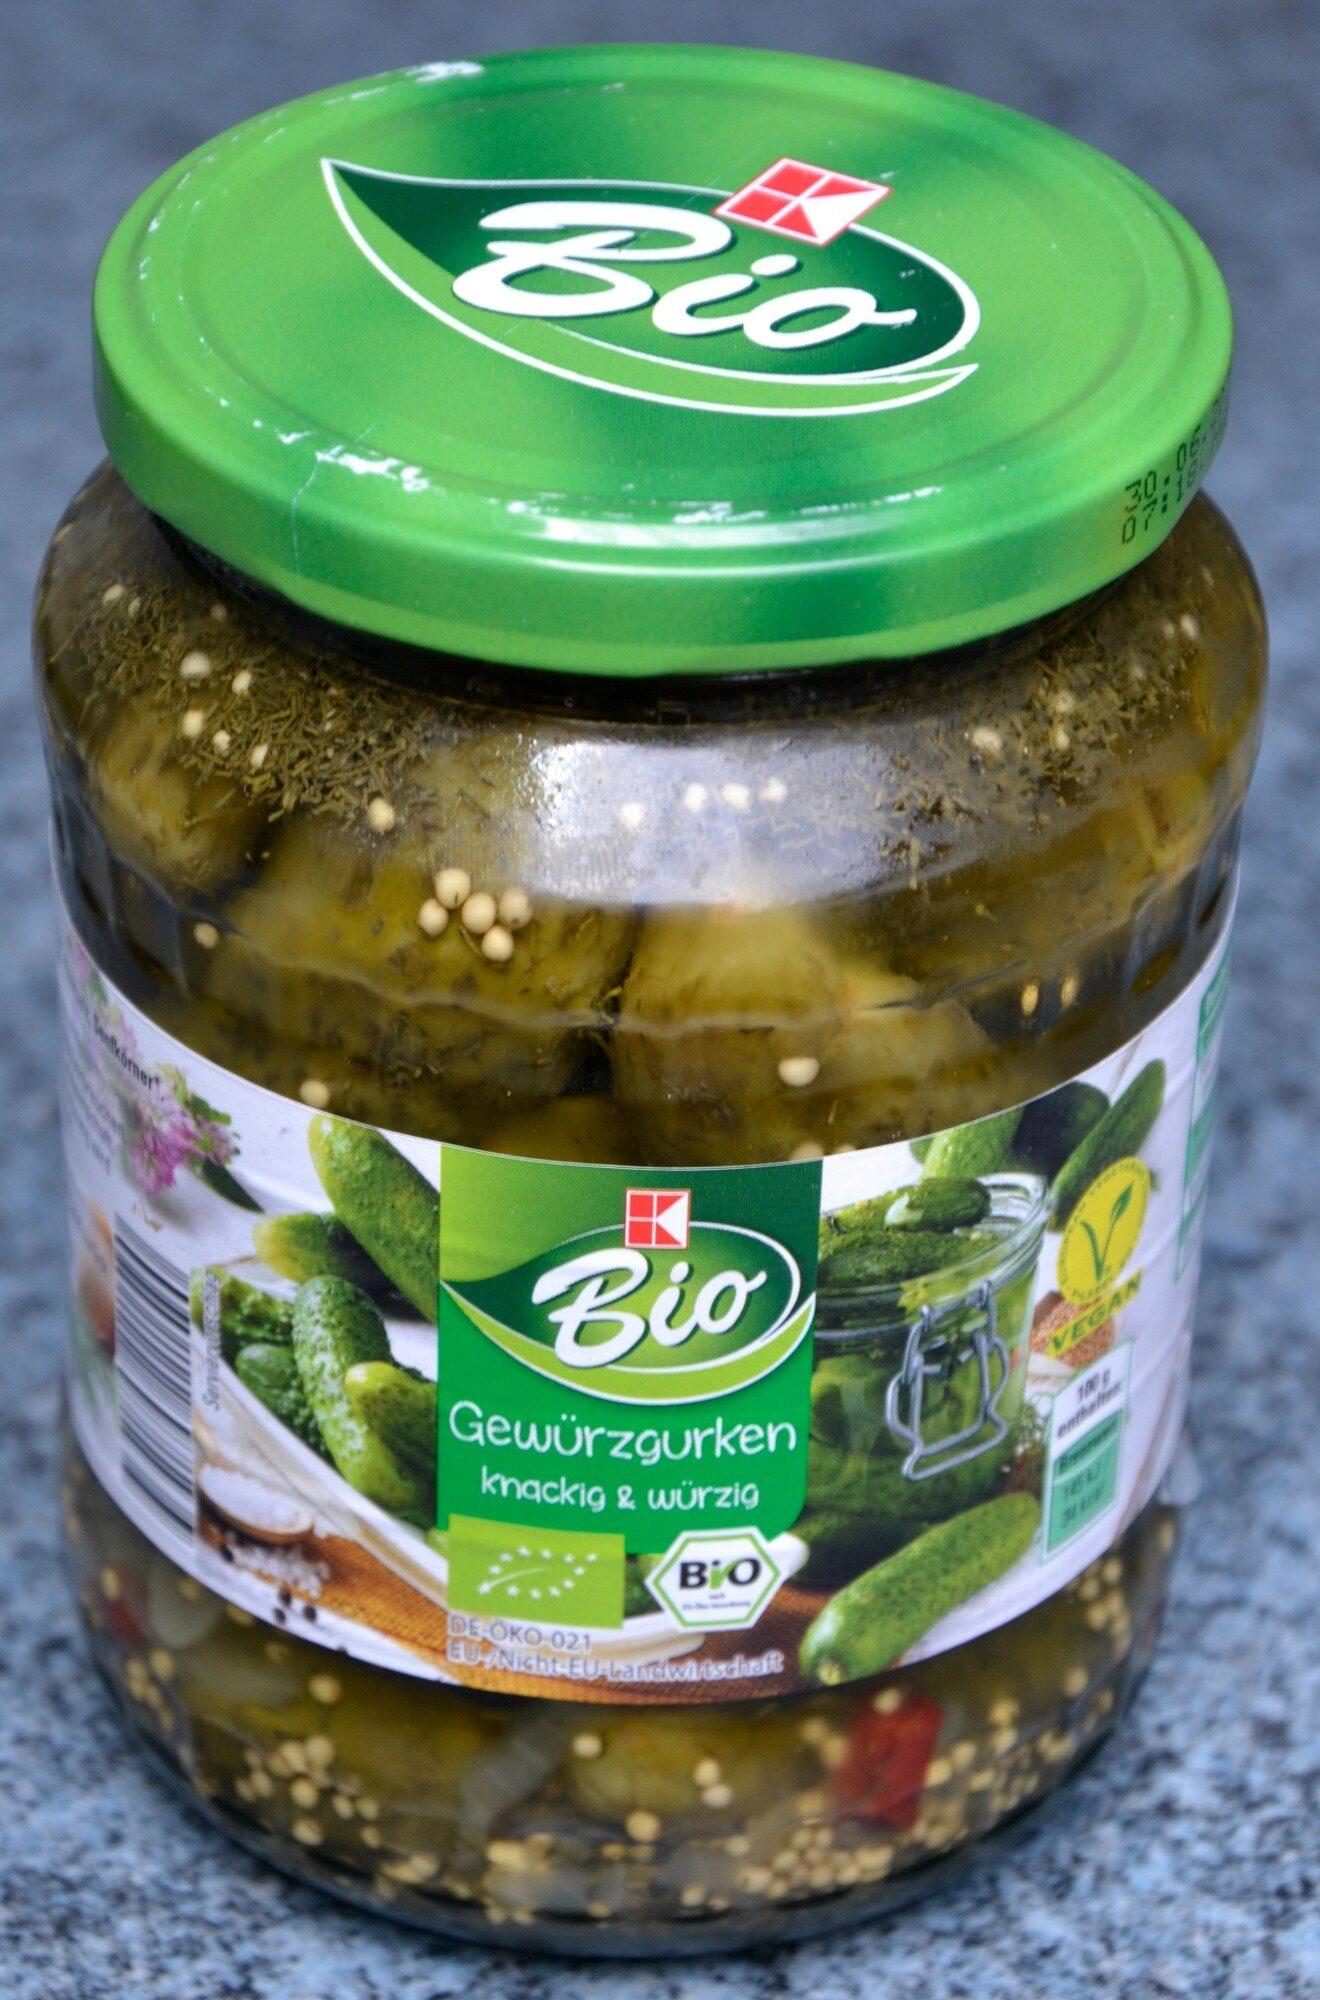 K-Bio Gewürzgurken - Product